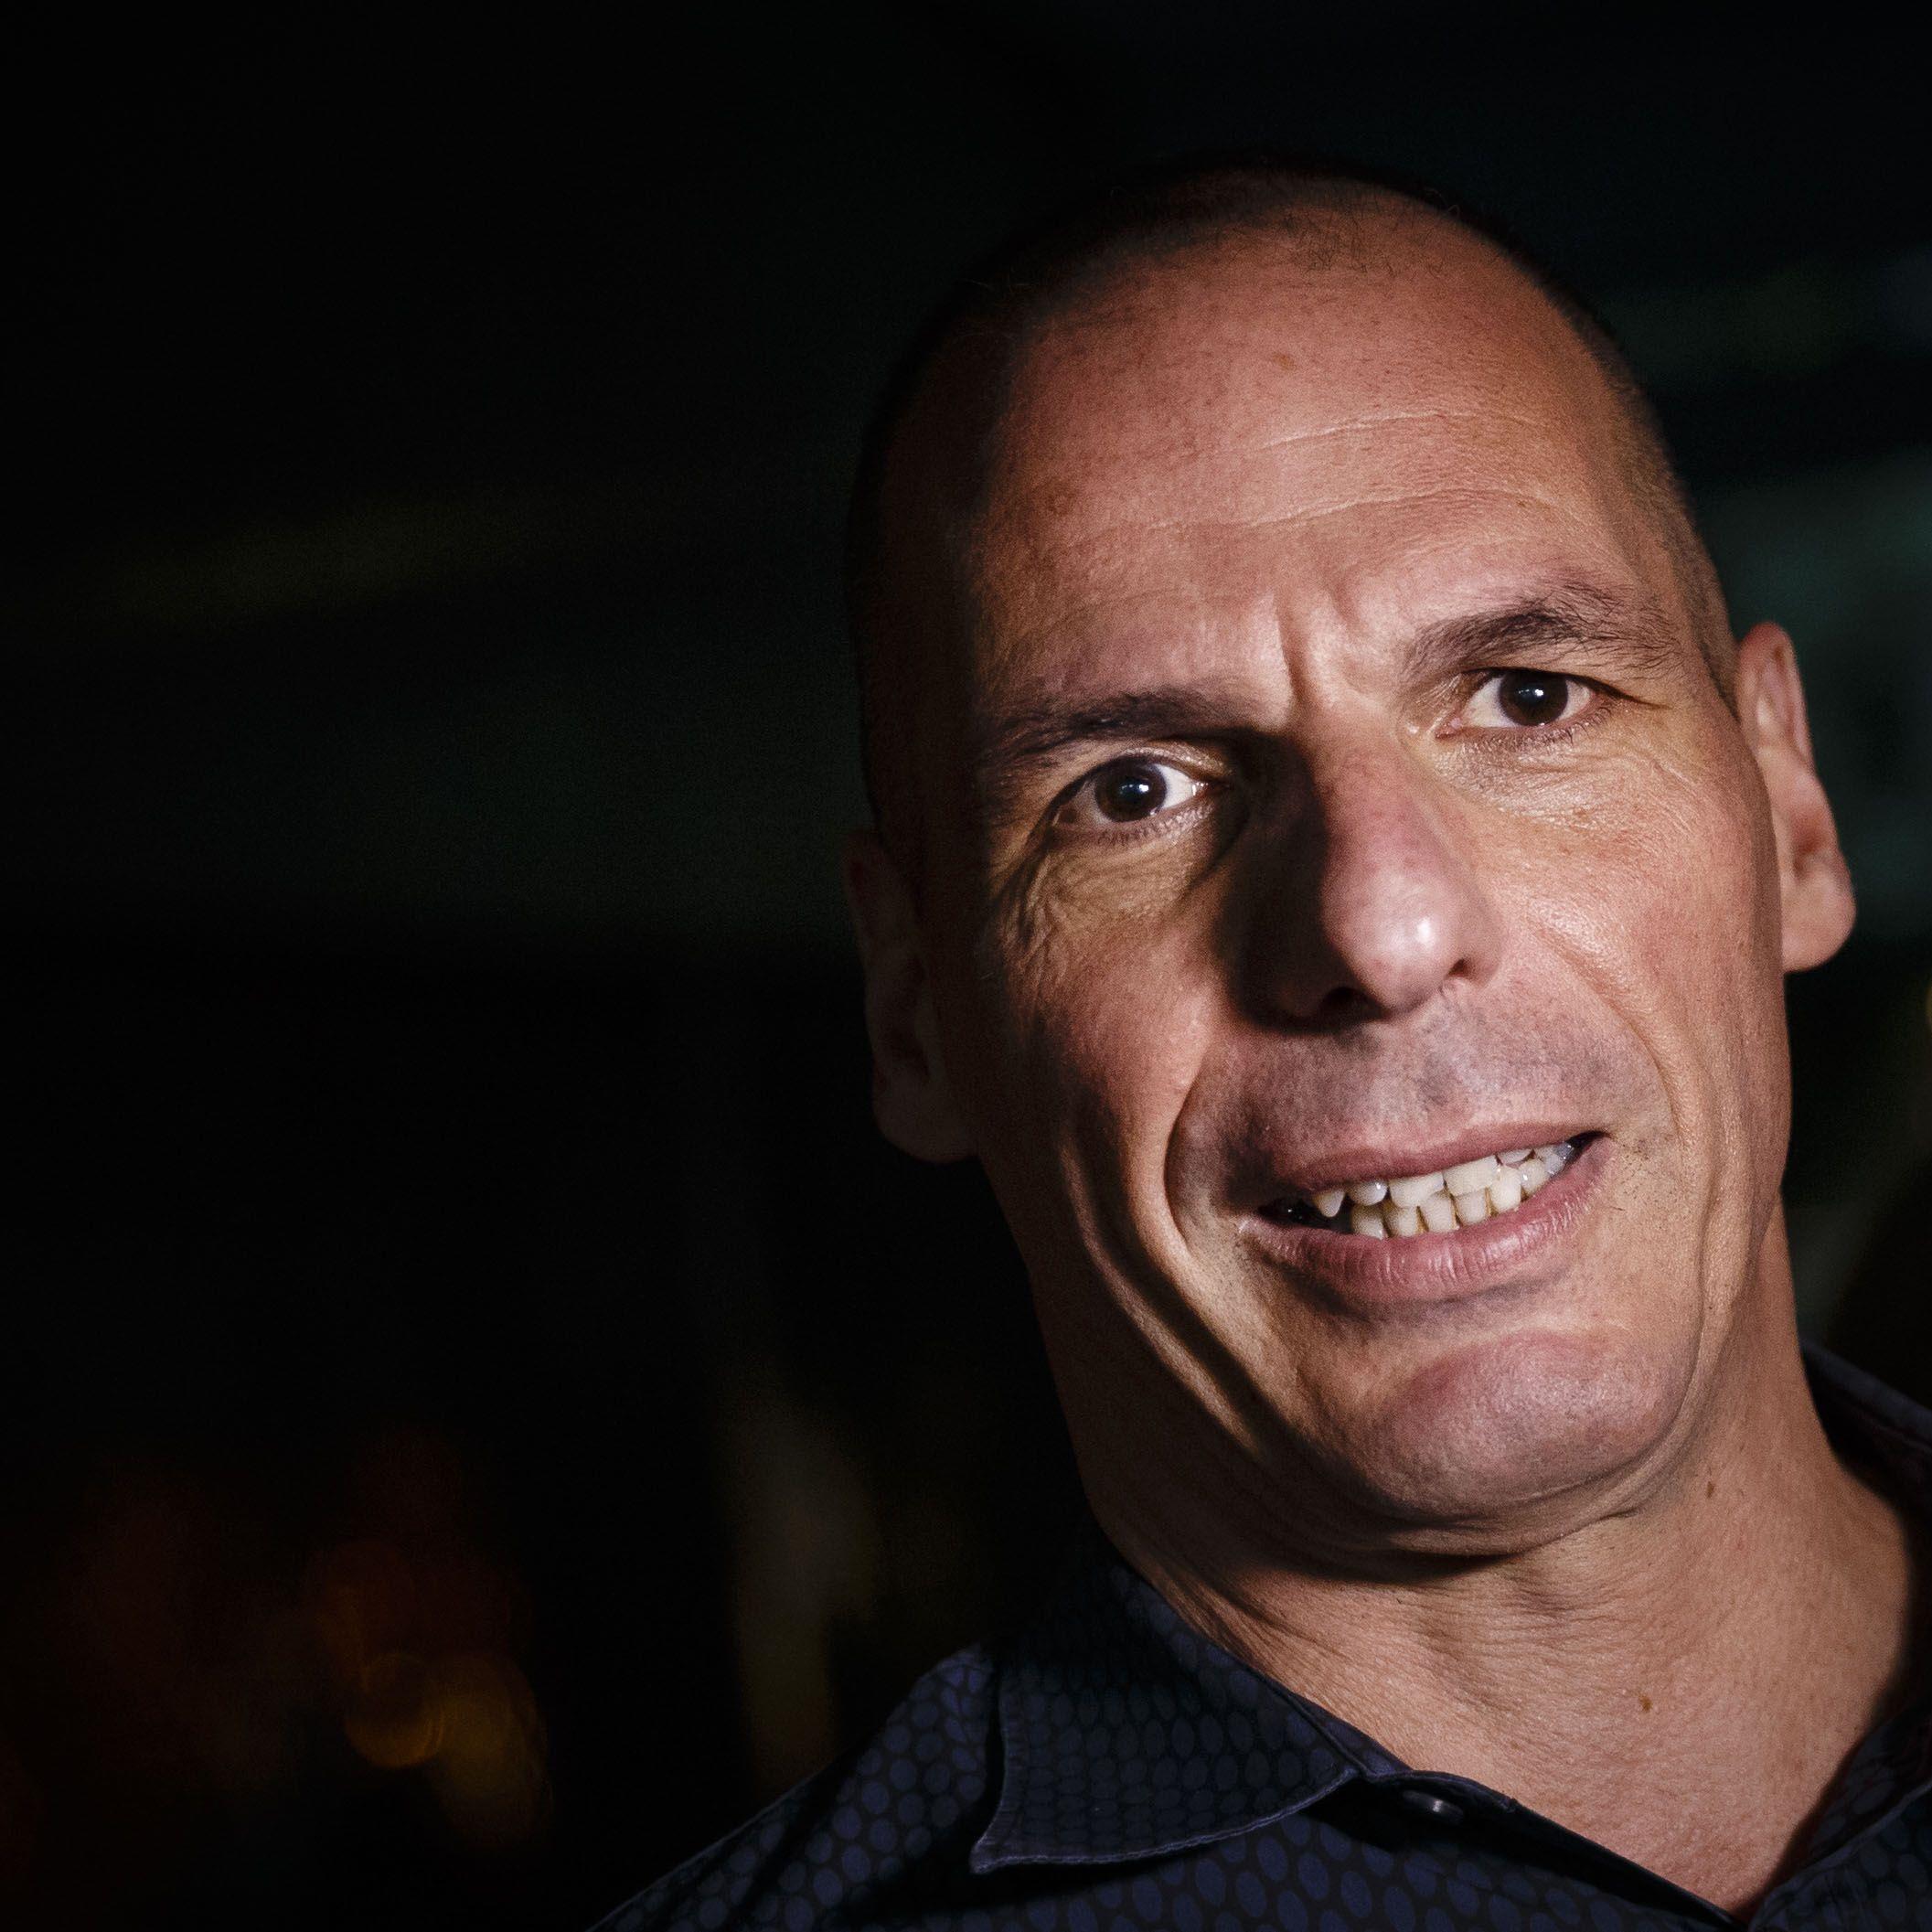 Varoufakis: Geldgeber wollen Angst schüren.